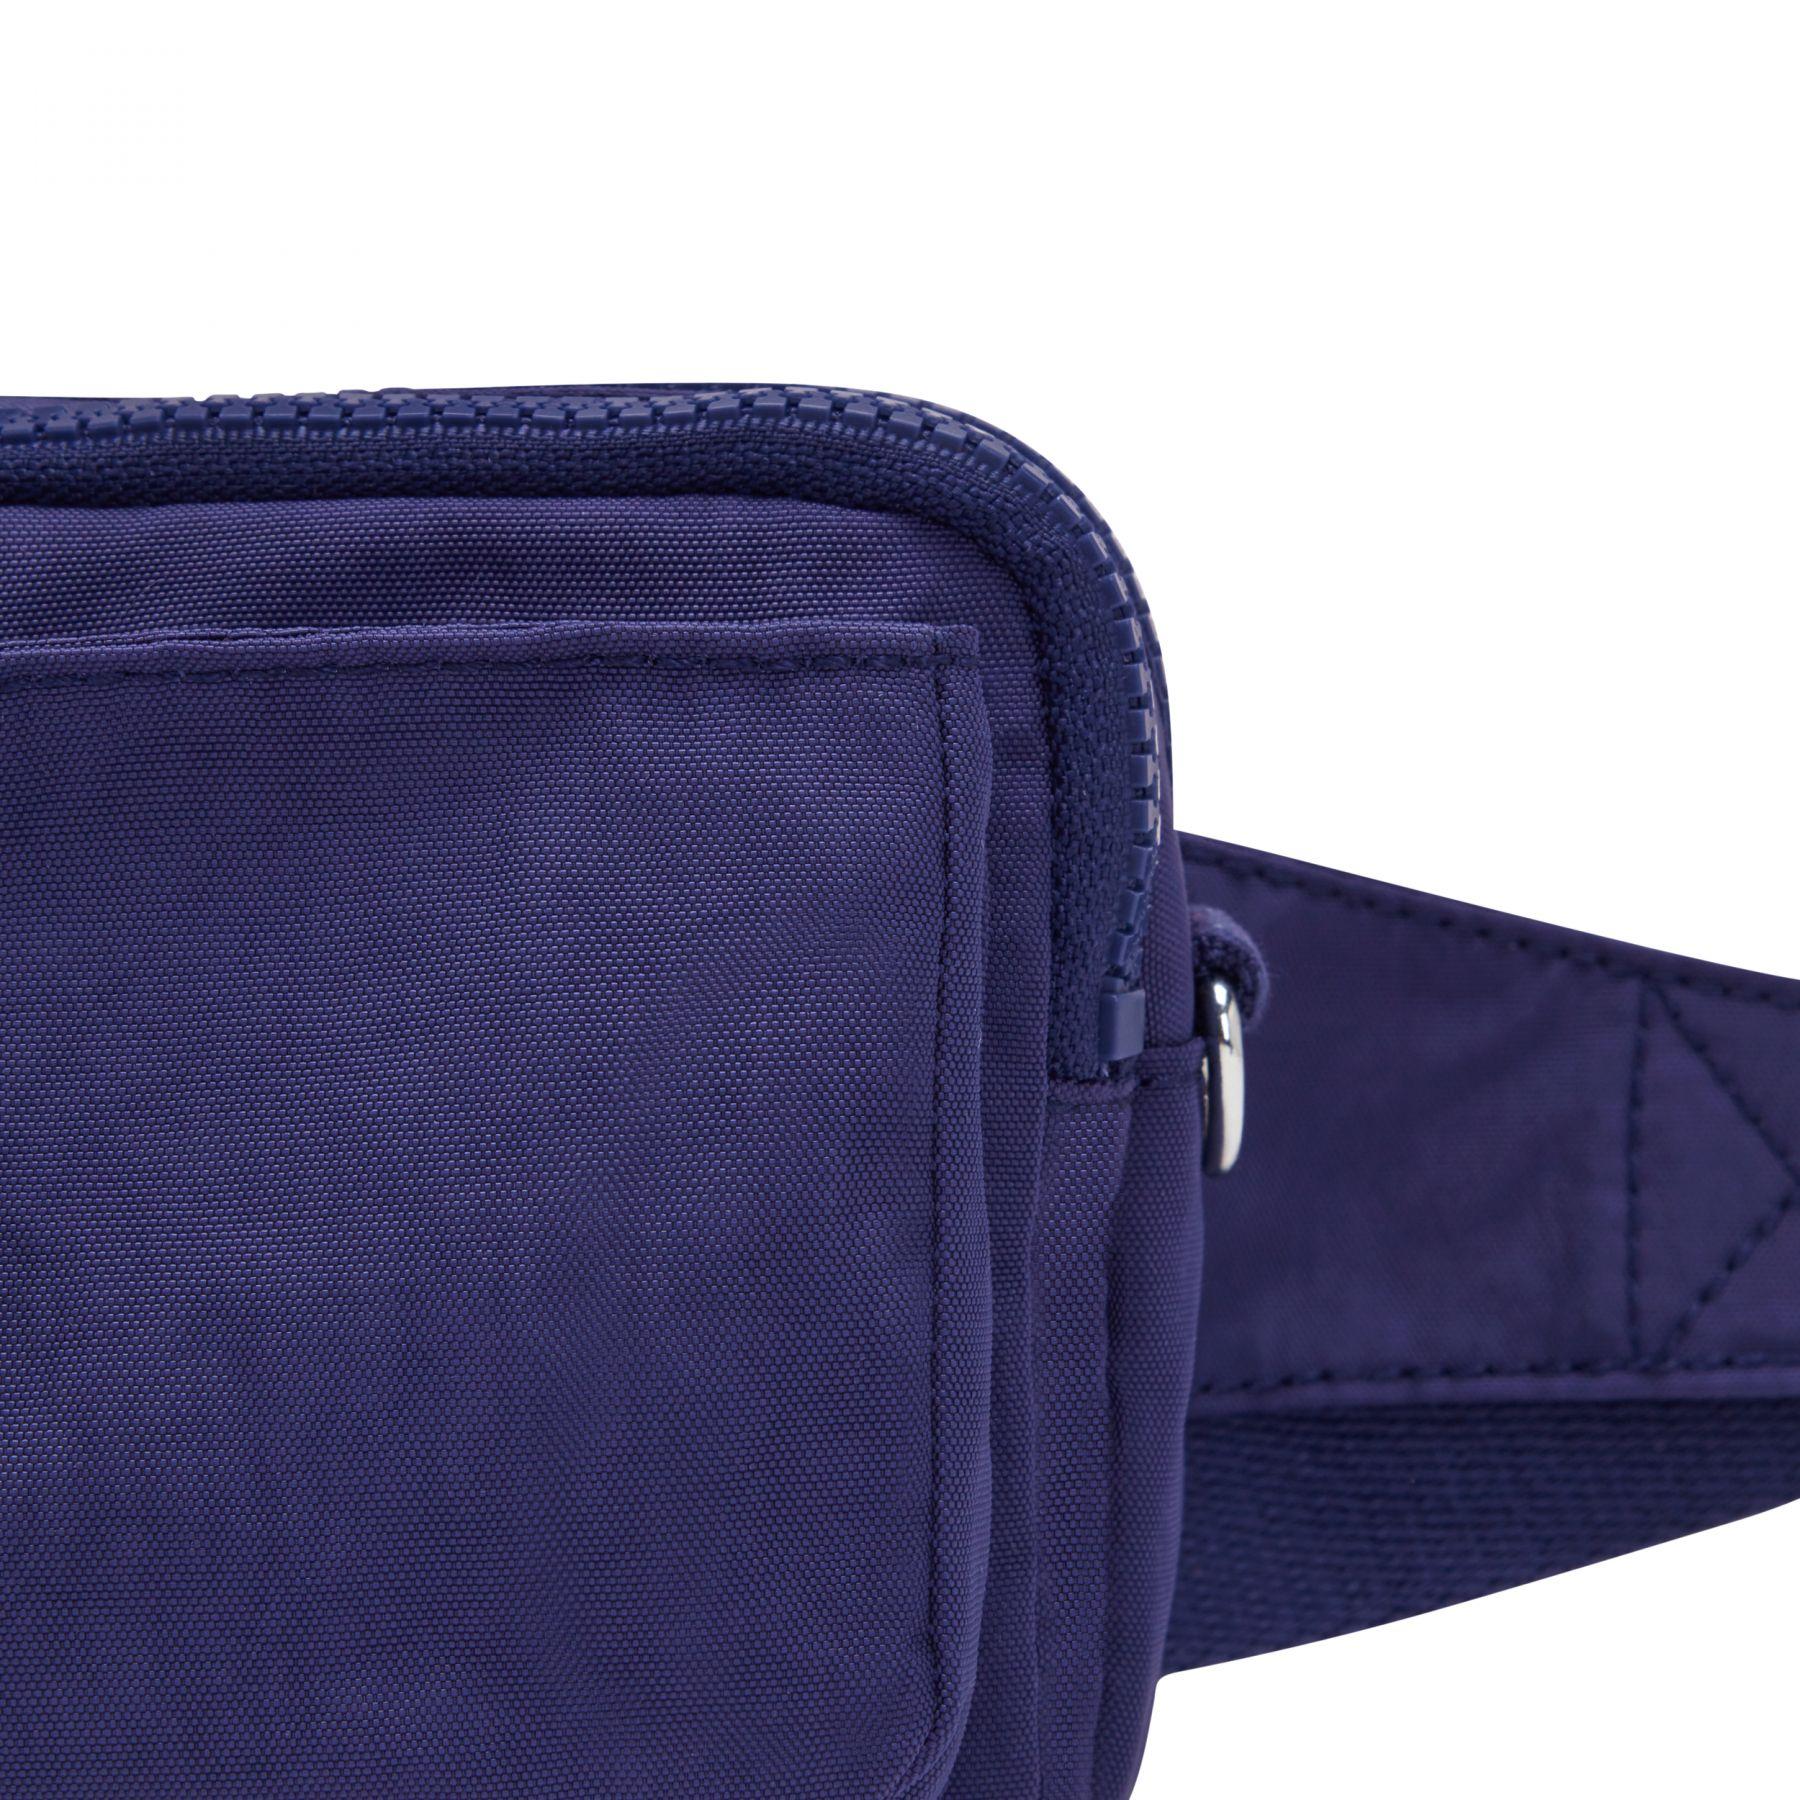 ABANU MULTI BAGS by Kipling - view 5